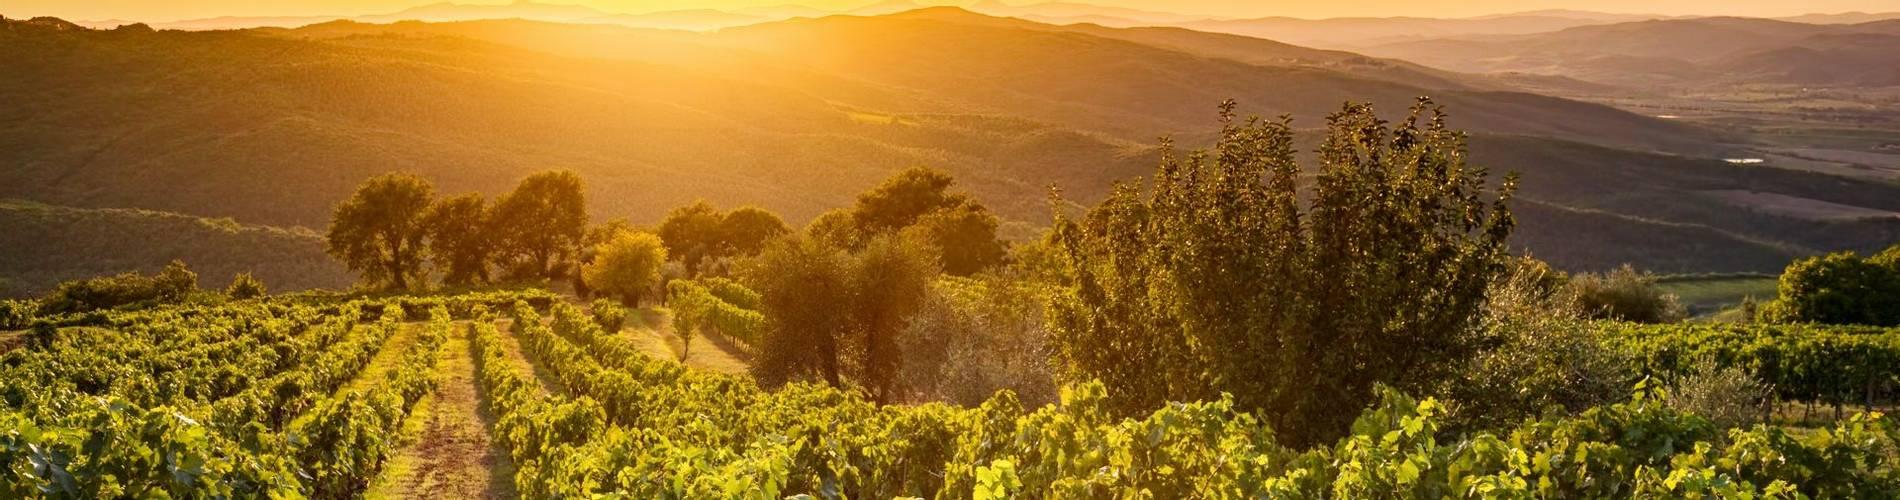 Tuscany Region Image.jpg